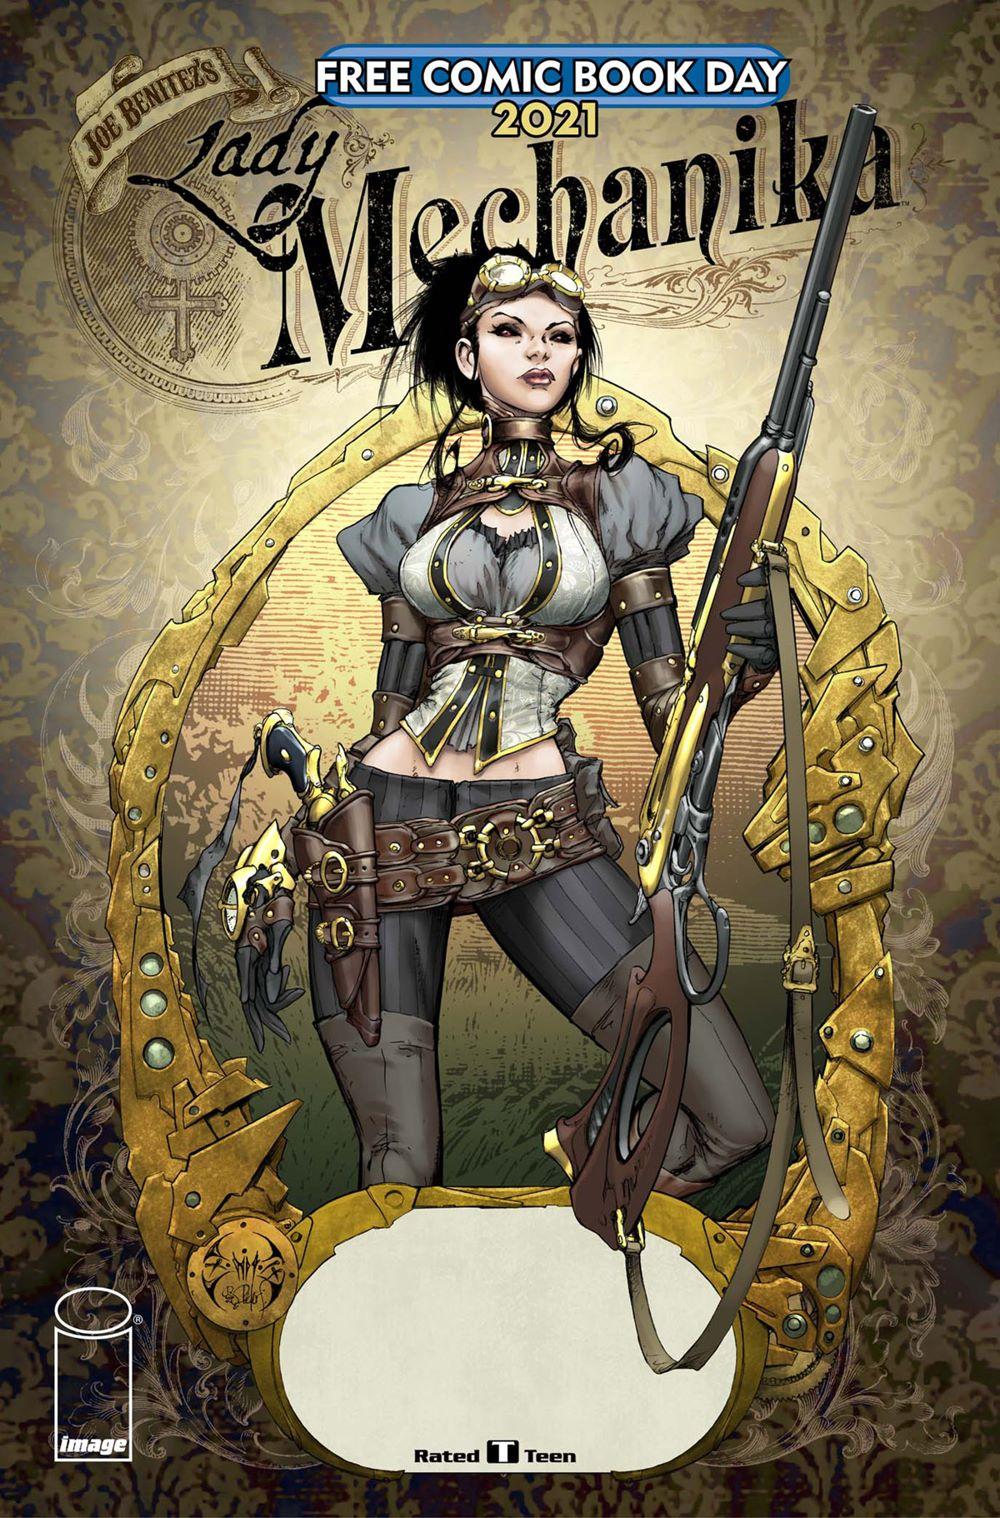 FCBD21_GOLD_Image_Lady-Mechanika-FCBD-2021 Free Comic Book Day 2021 Gold Sponsor Comic Books announced